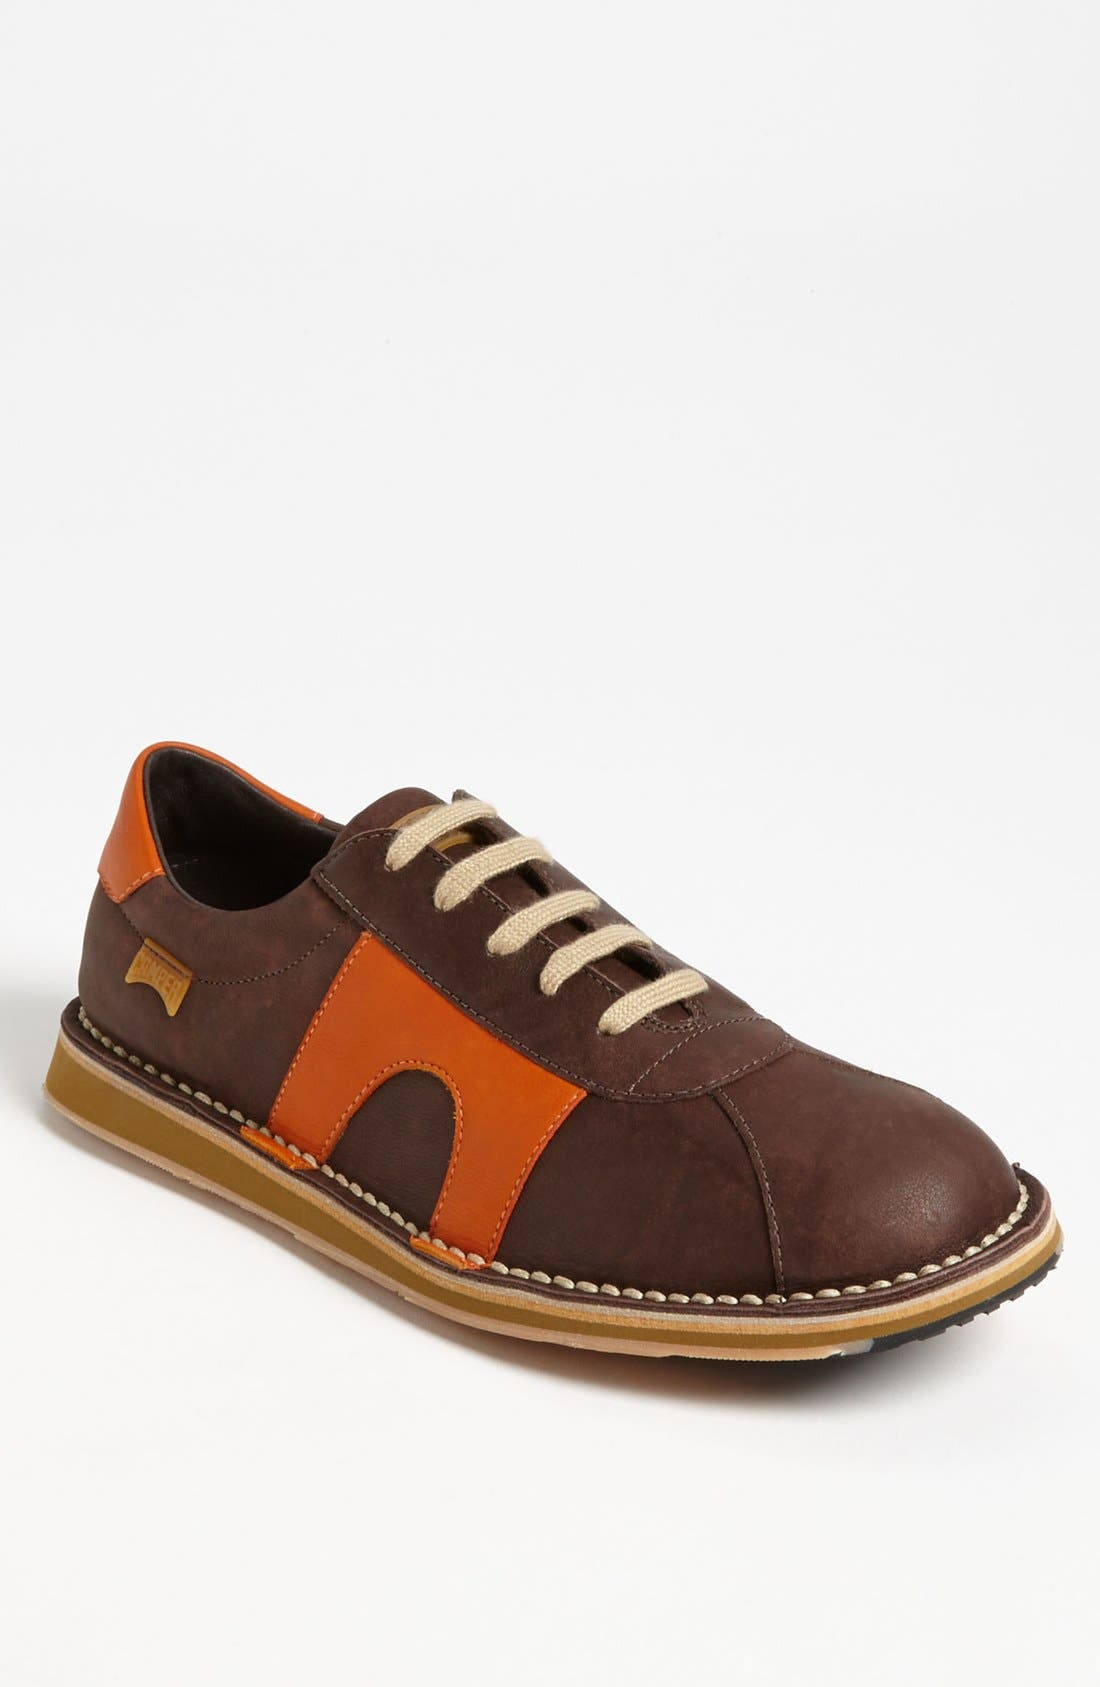 Alternate Image 1 Selected - Camper 'Brothers' Sneaker